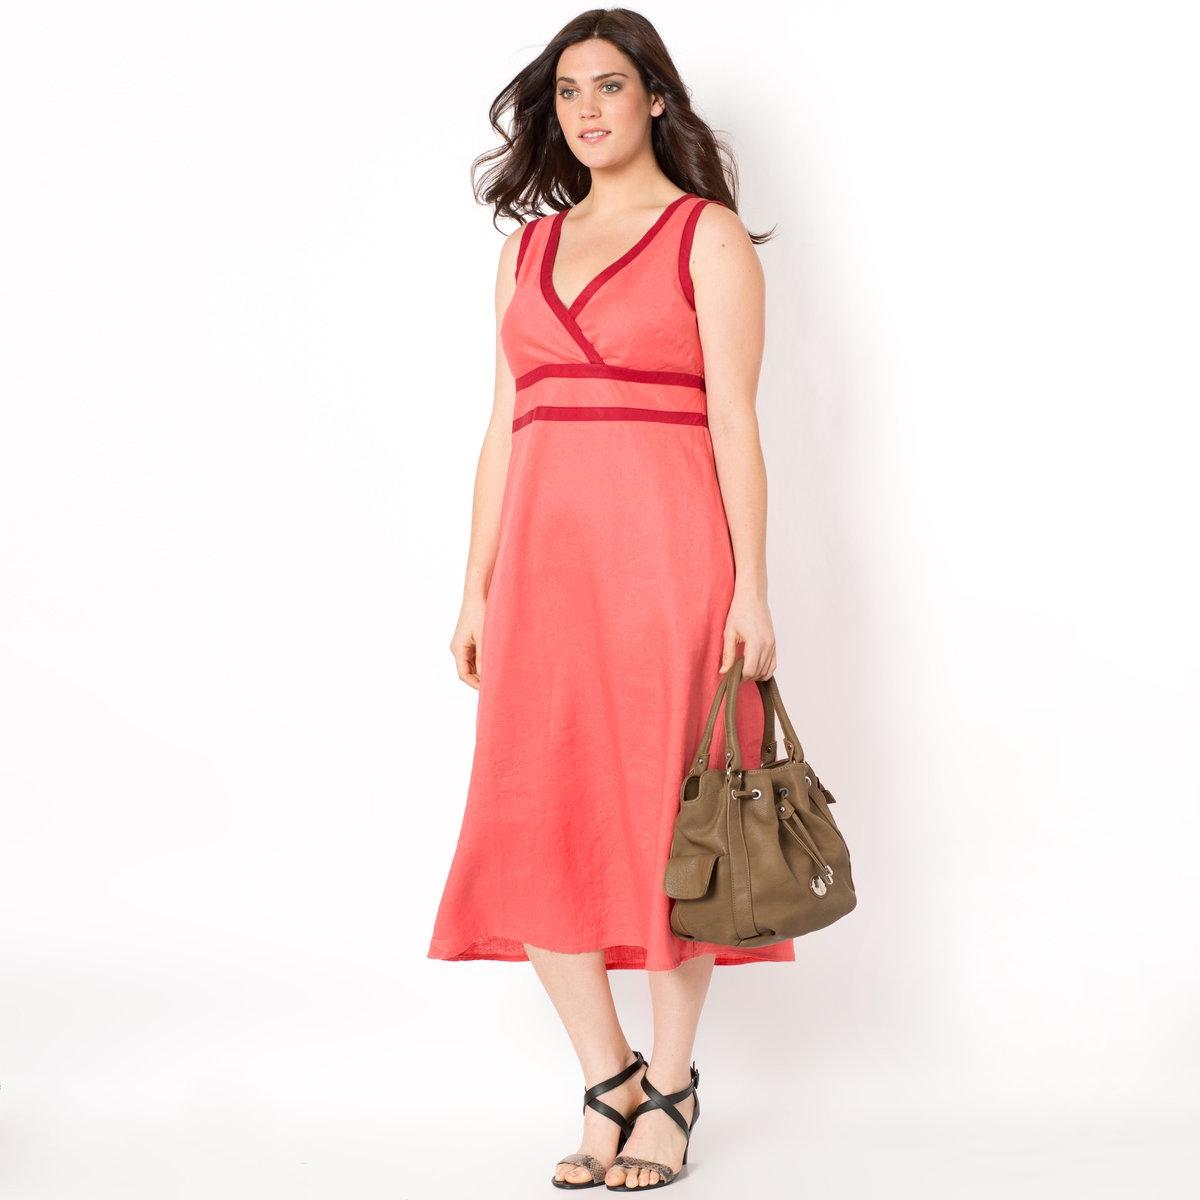 Платье длинное, 100% хлопка sexy lace spliced open back batwing sleeve black blouse for women